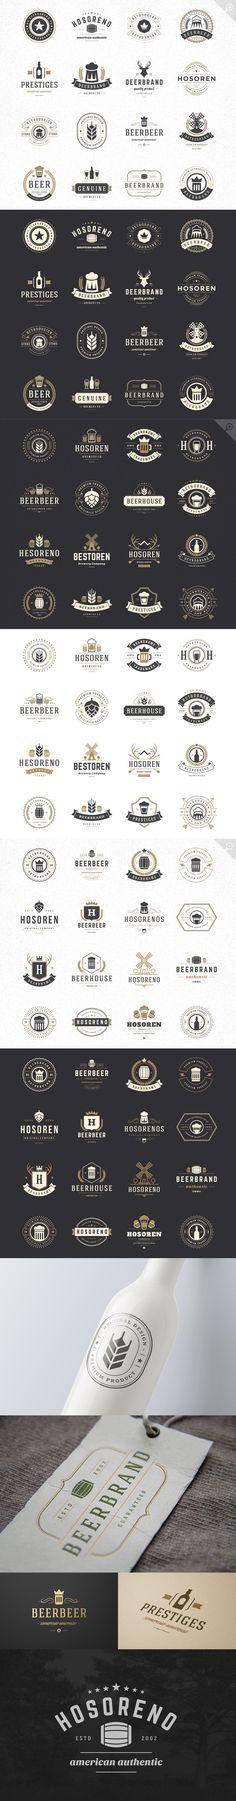 45 Beer brewery Retro Vintage Logotypes set. Vector design elements, business signs, logos, identity, labels, badges, stamps and other #design Download: https://creativemarket.com/VasyaKo/374643-45-Beer-Logotypes-and-Badges?u=ksioks #beerart